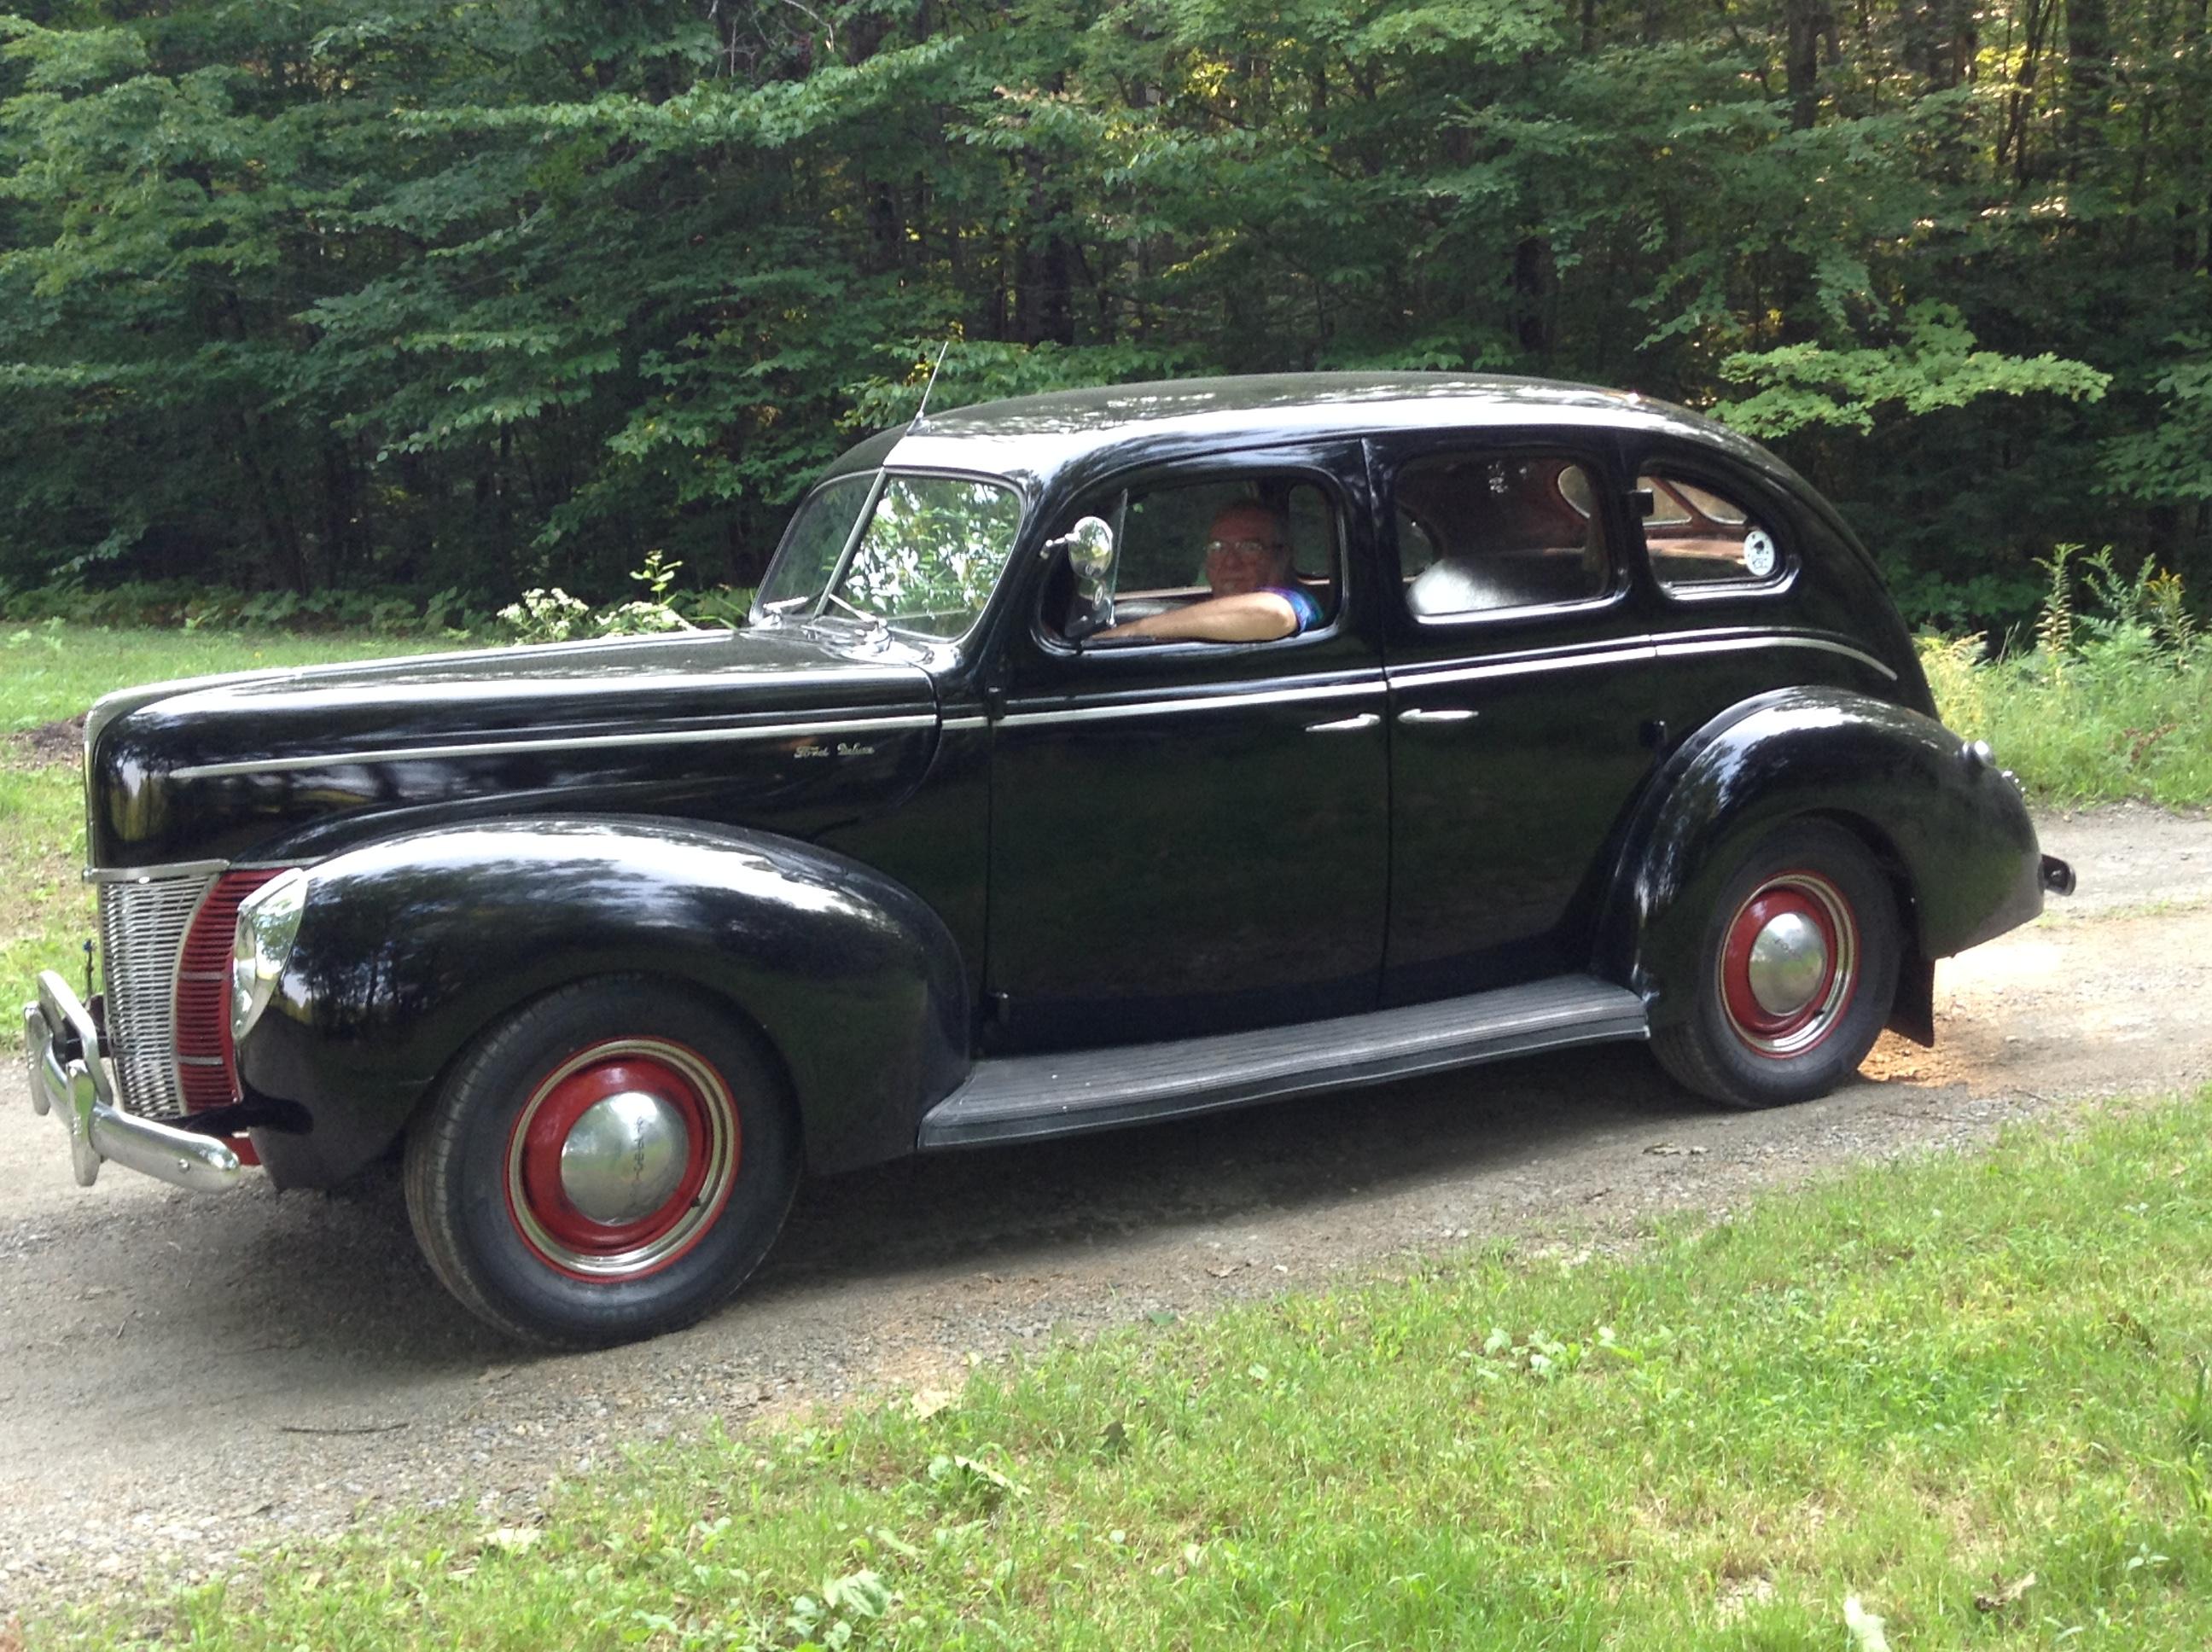 [1940 Ford Sedan Deluxe]